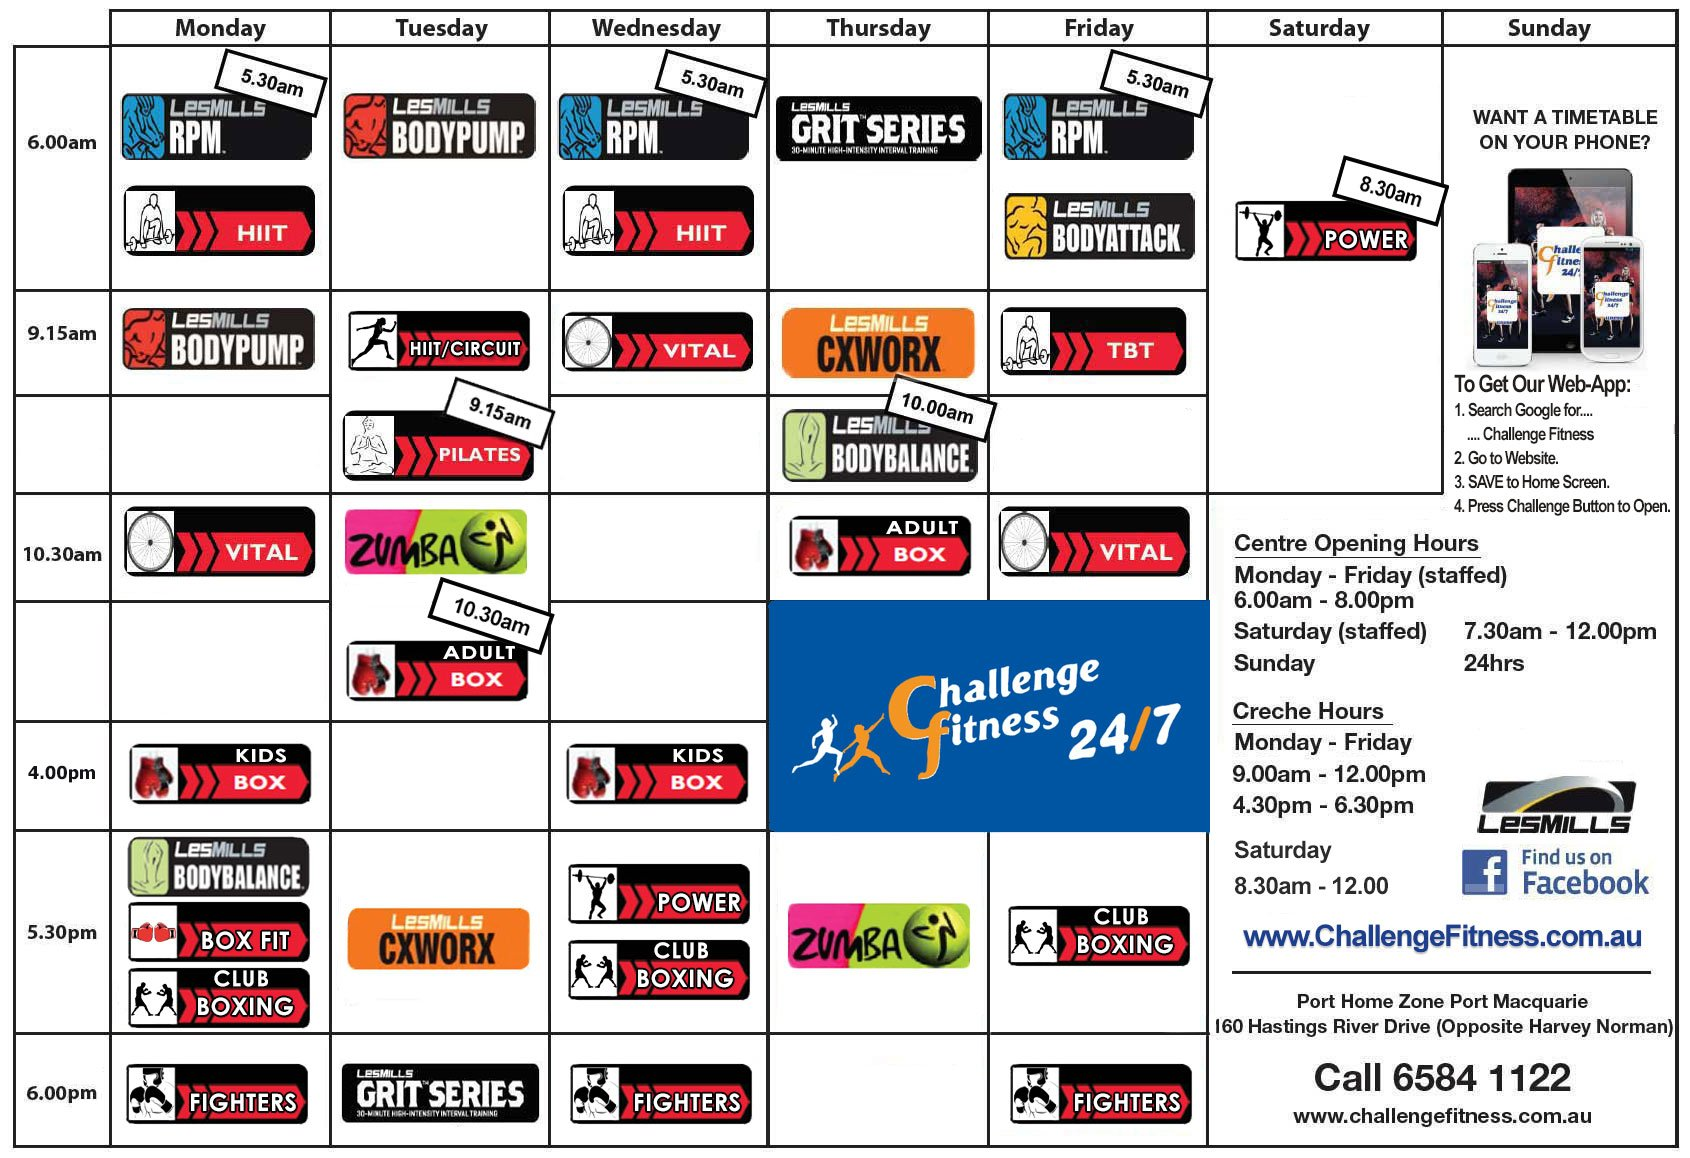 November 2017 Challenge Fitness Classes Timetable